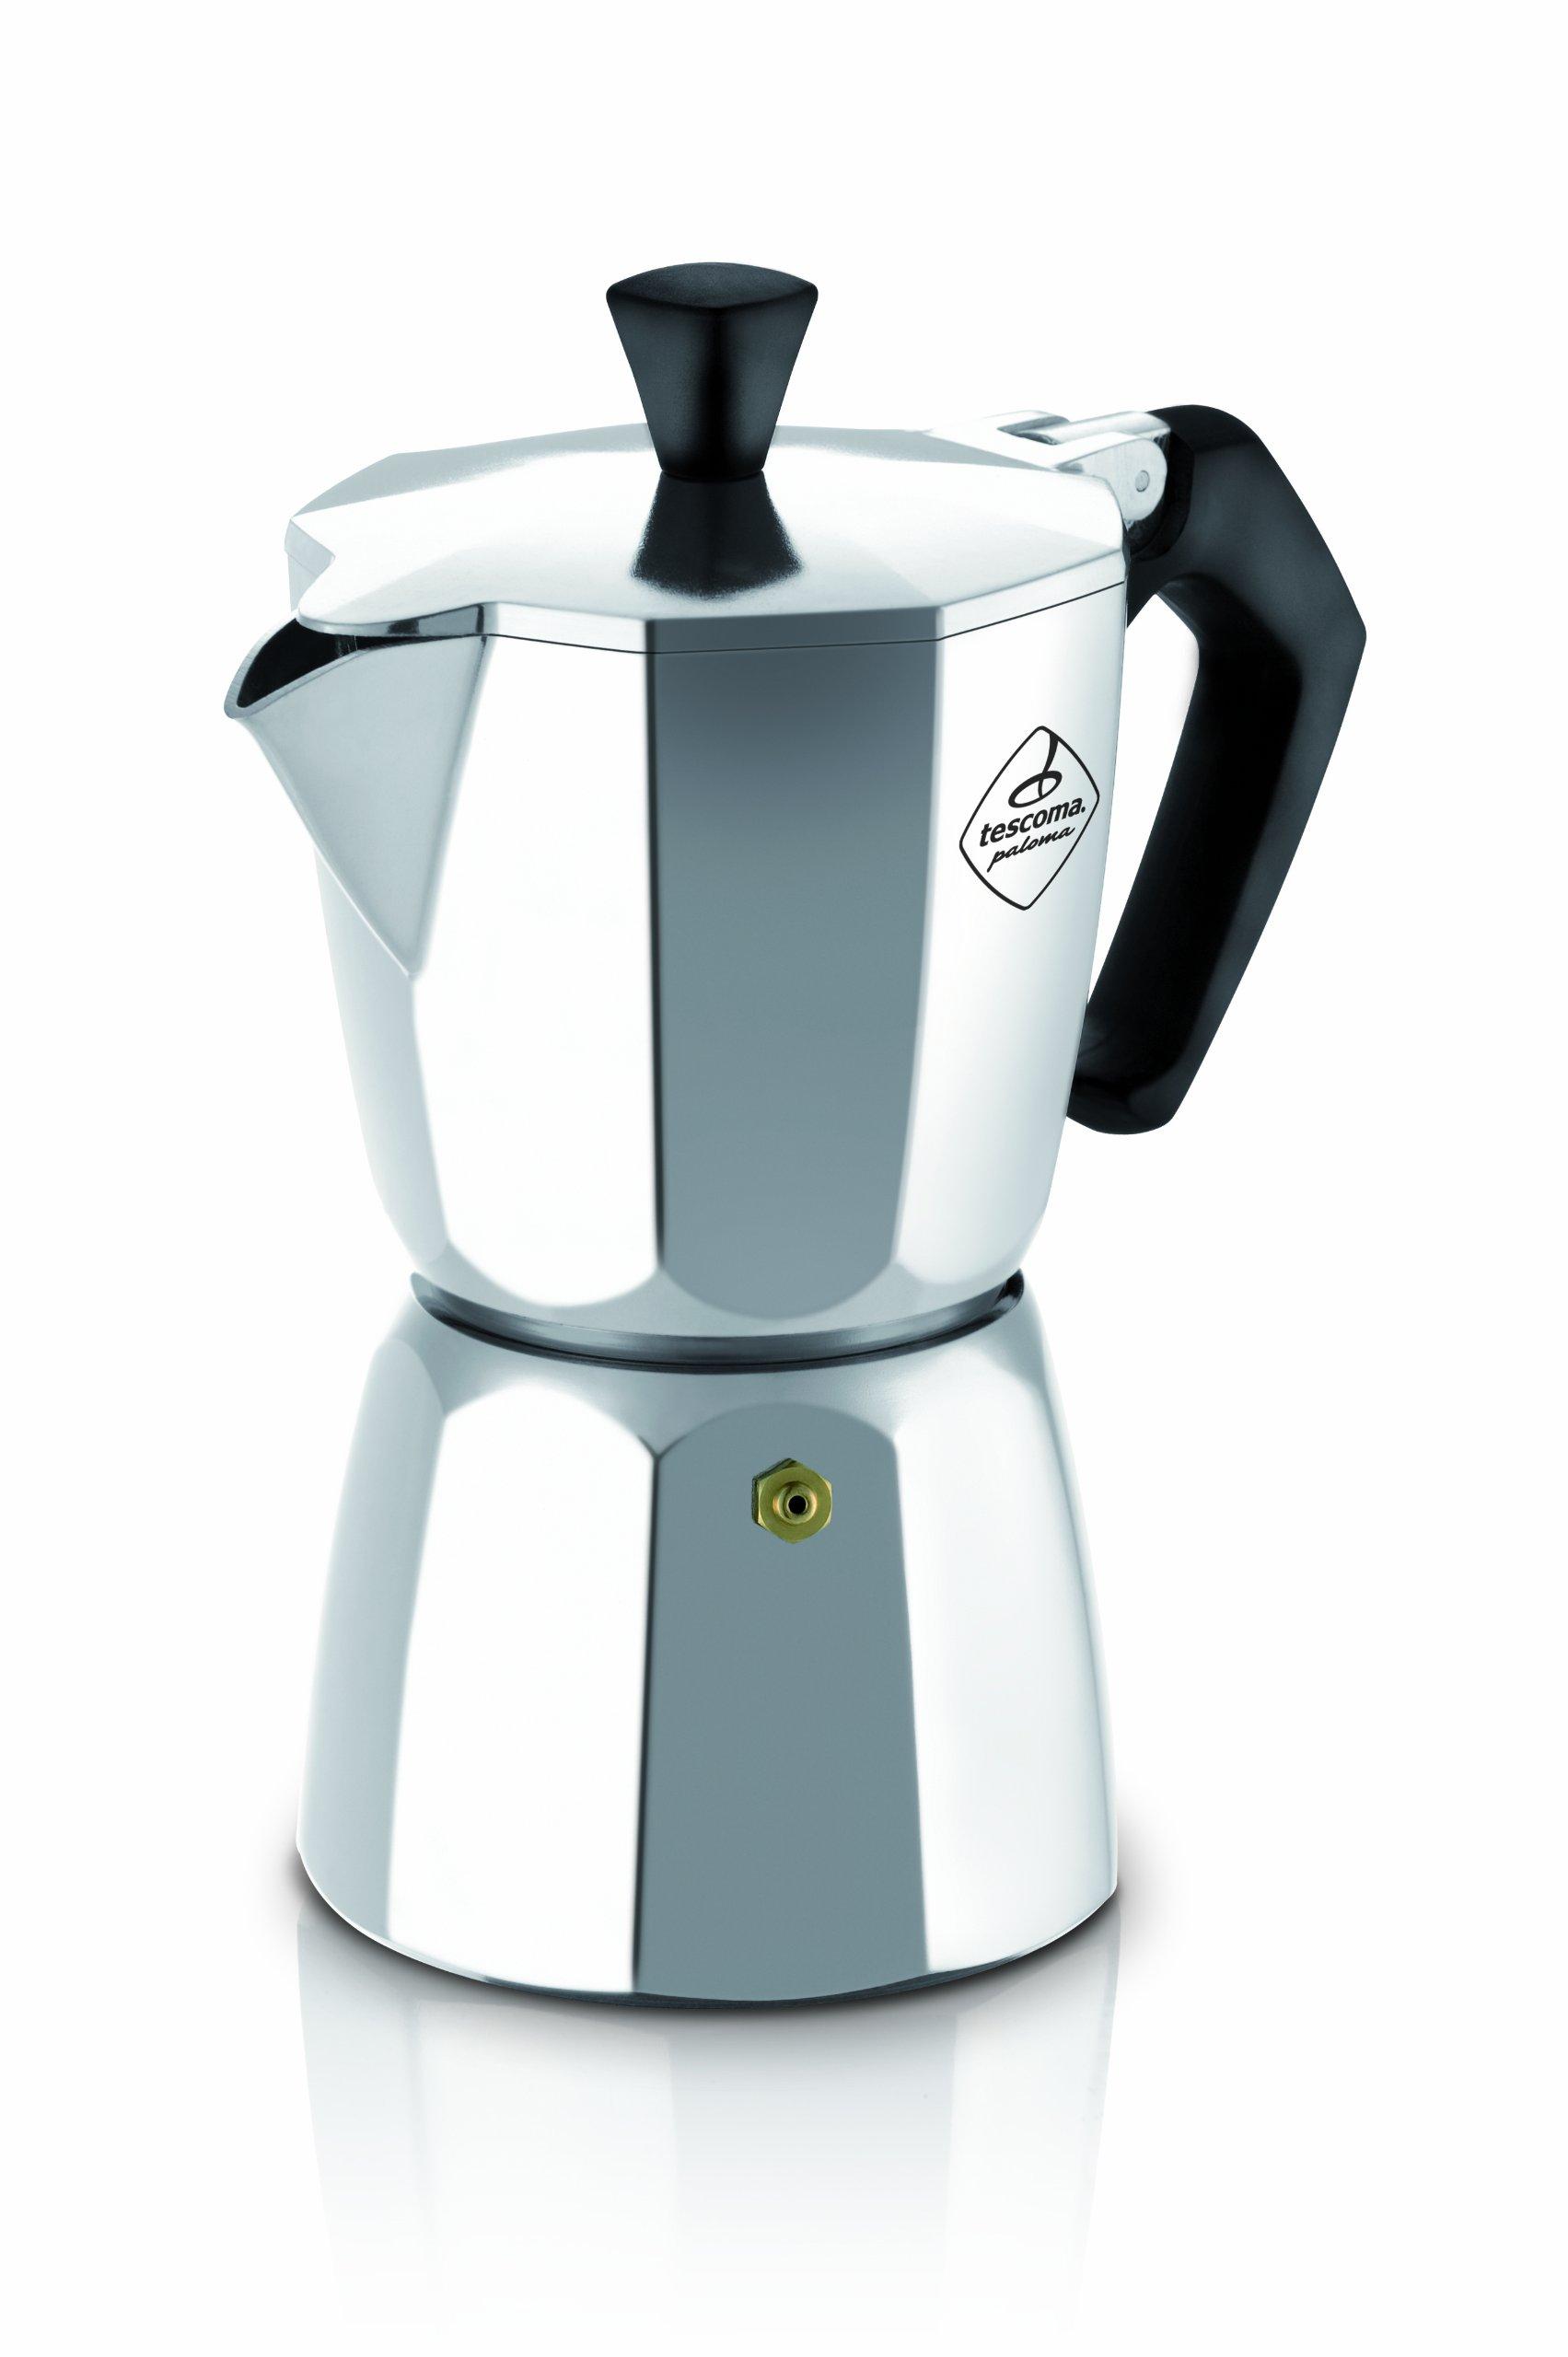 Tescoma Coffee Maker Paloma, 9 Cups by Tescoma (Image #1)